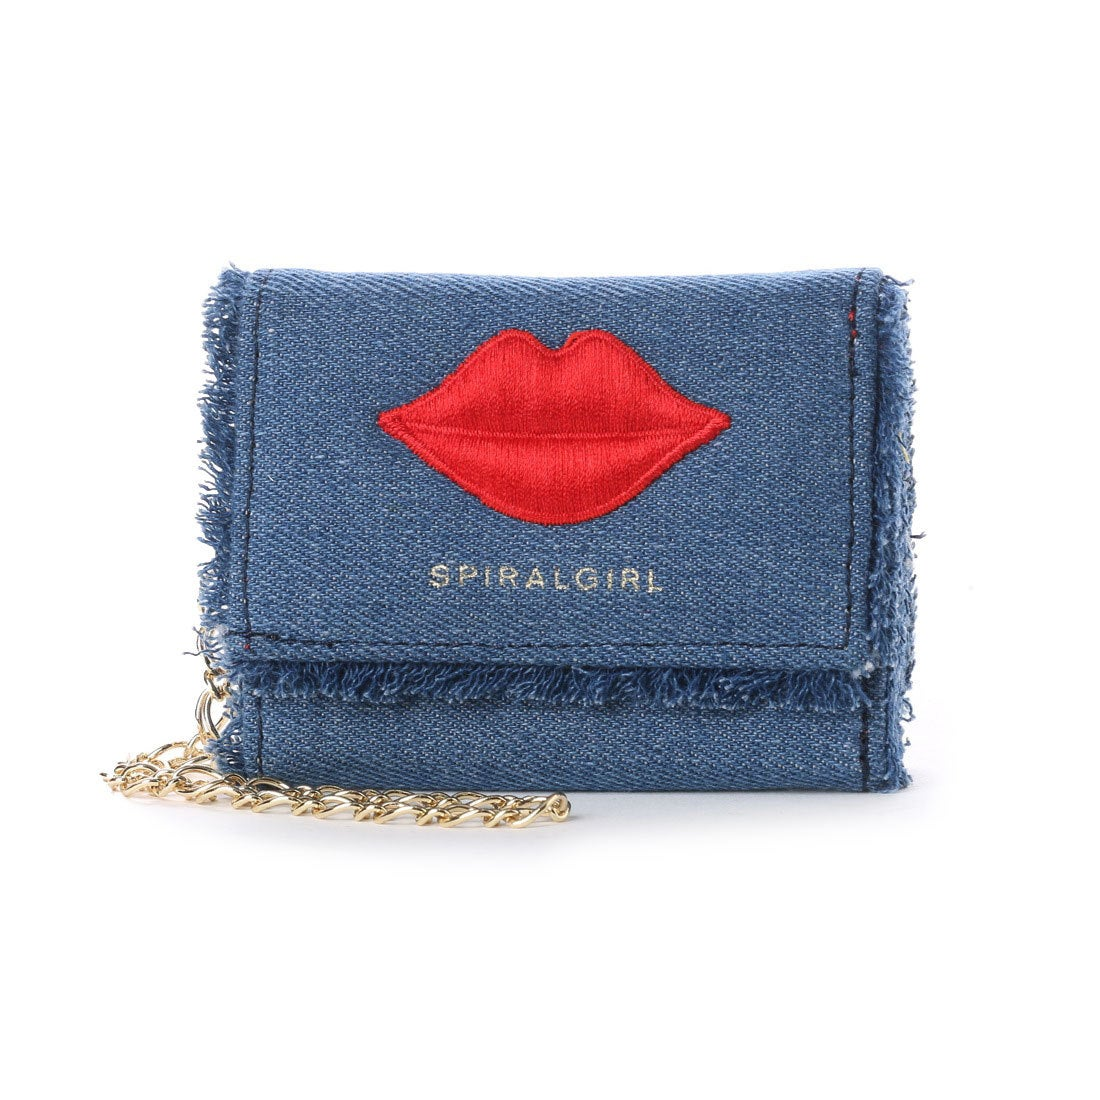 08414fe89c7d スパイラルガール SPIRAL GIRL リップポイント刺繍3つ折りウォレット (ブルー) -靴&ファッション通販 ロコンド〜自宅で試着、気軽に返品